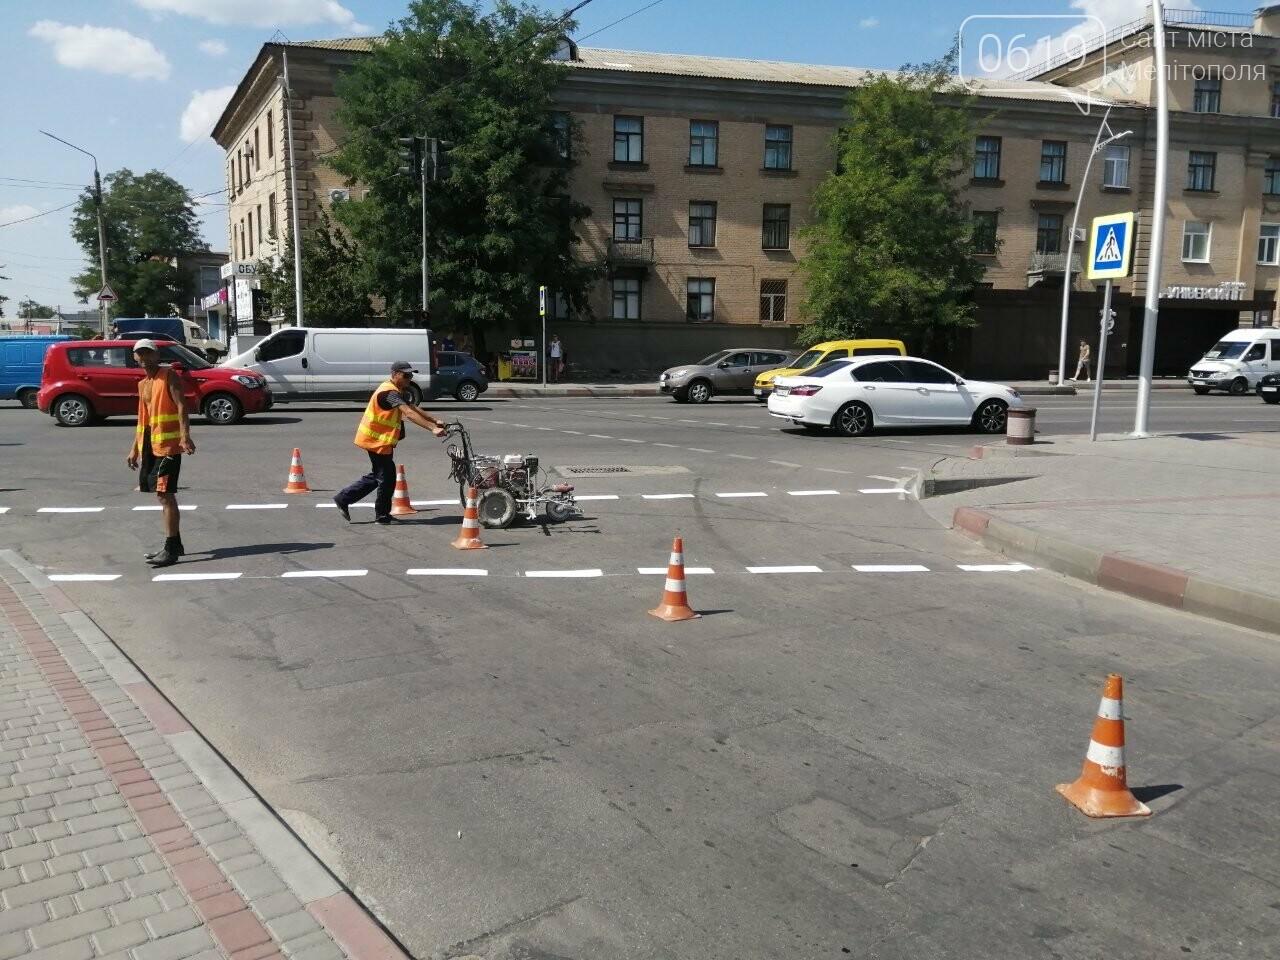 В центре Мелитополя обновили дорожную разметку, фото-3